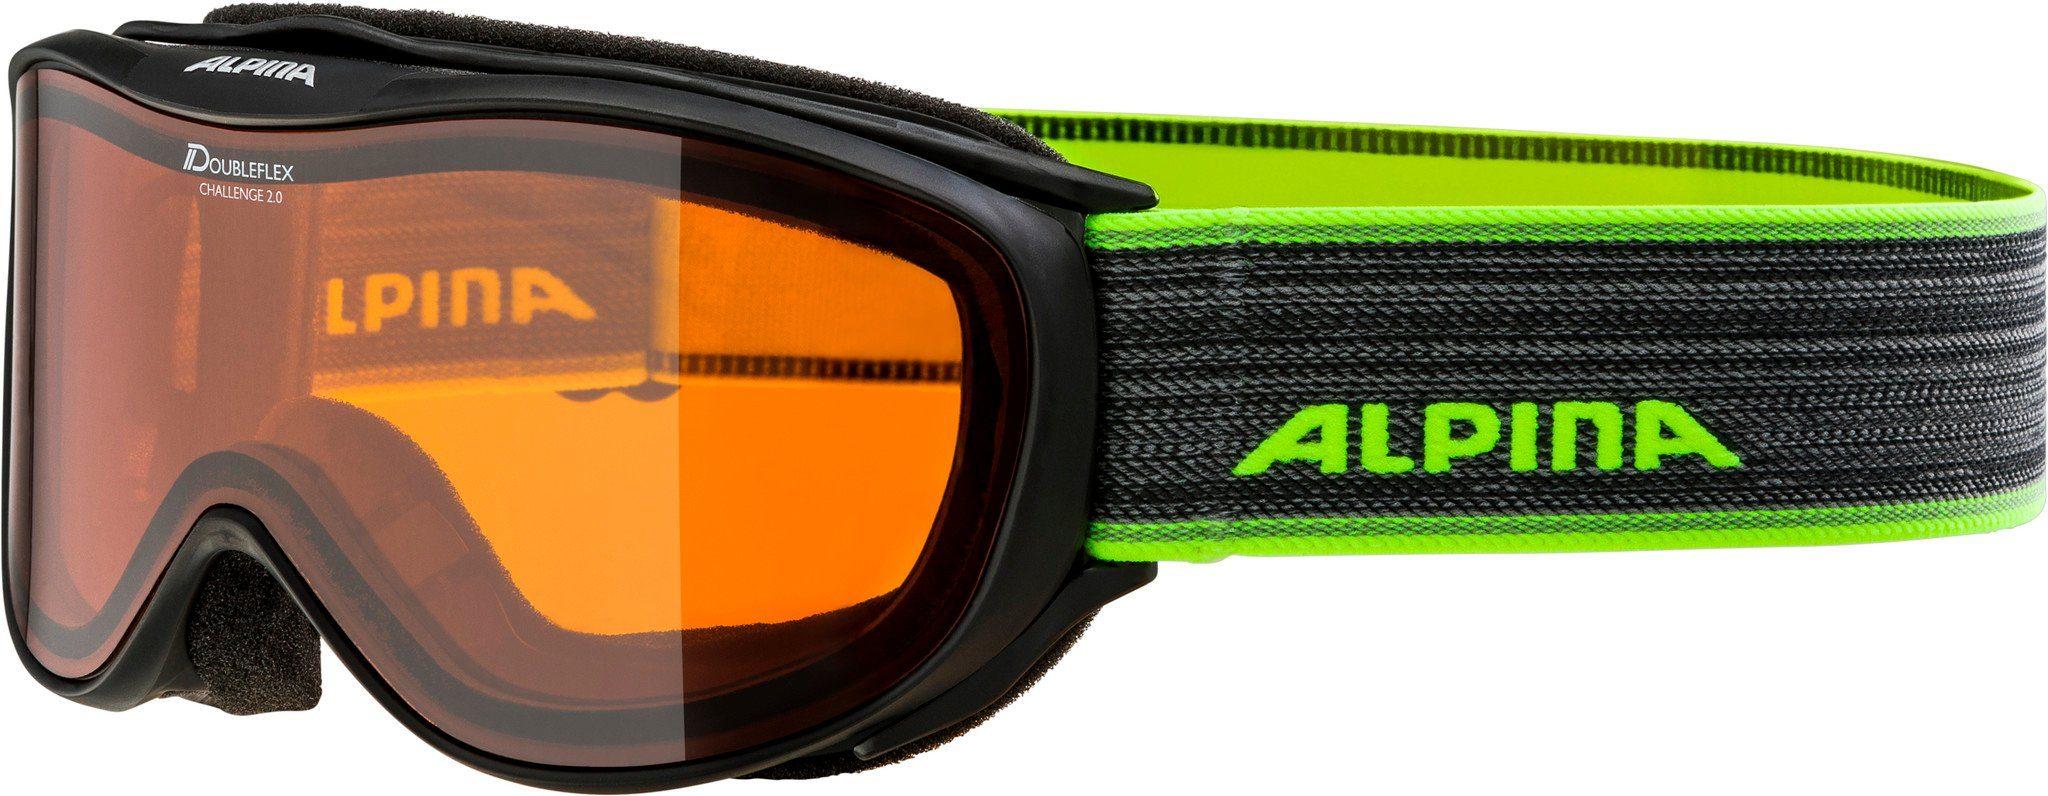 Alpina Sports Sportbrille »Challenge 2.0 Doubleflex S2 Goggle«